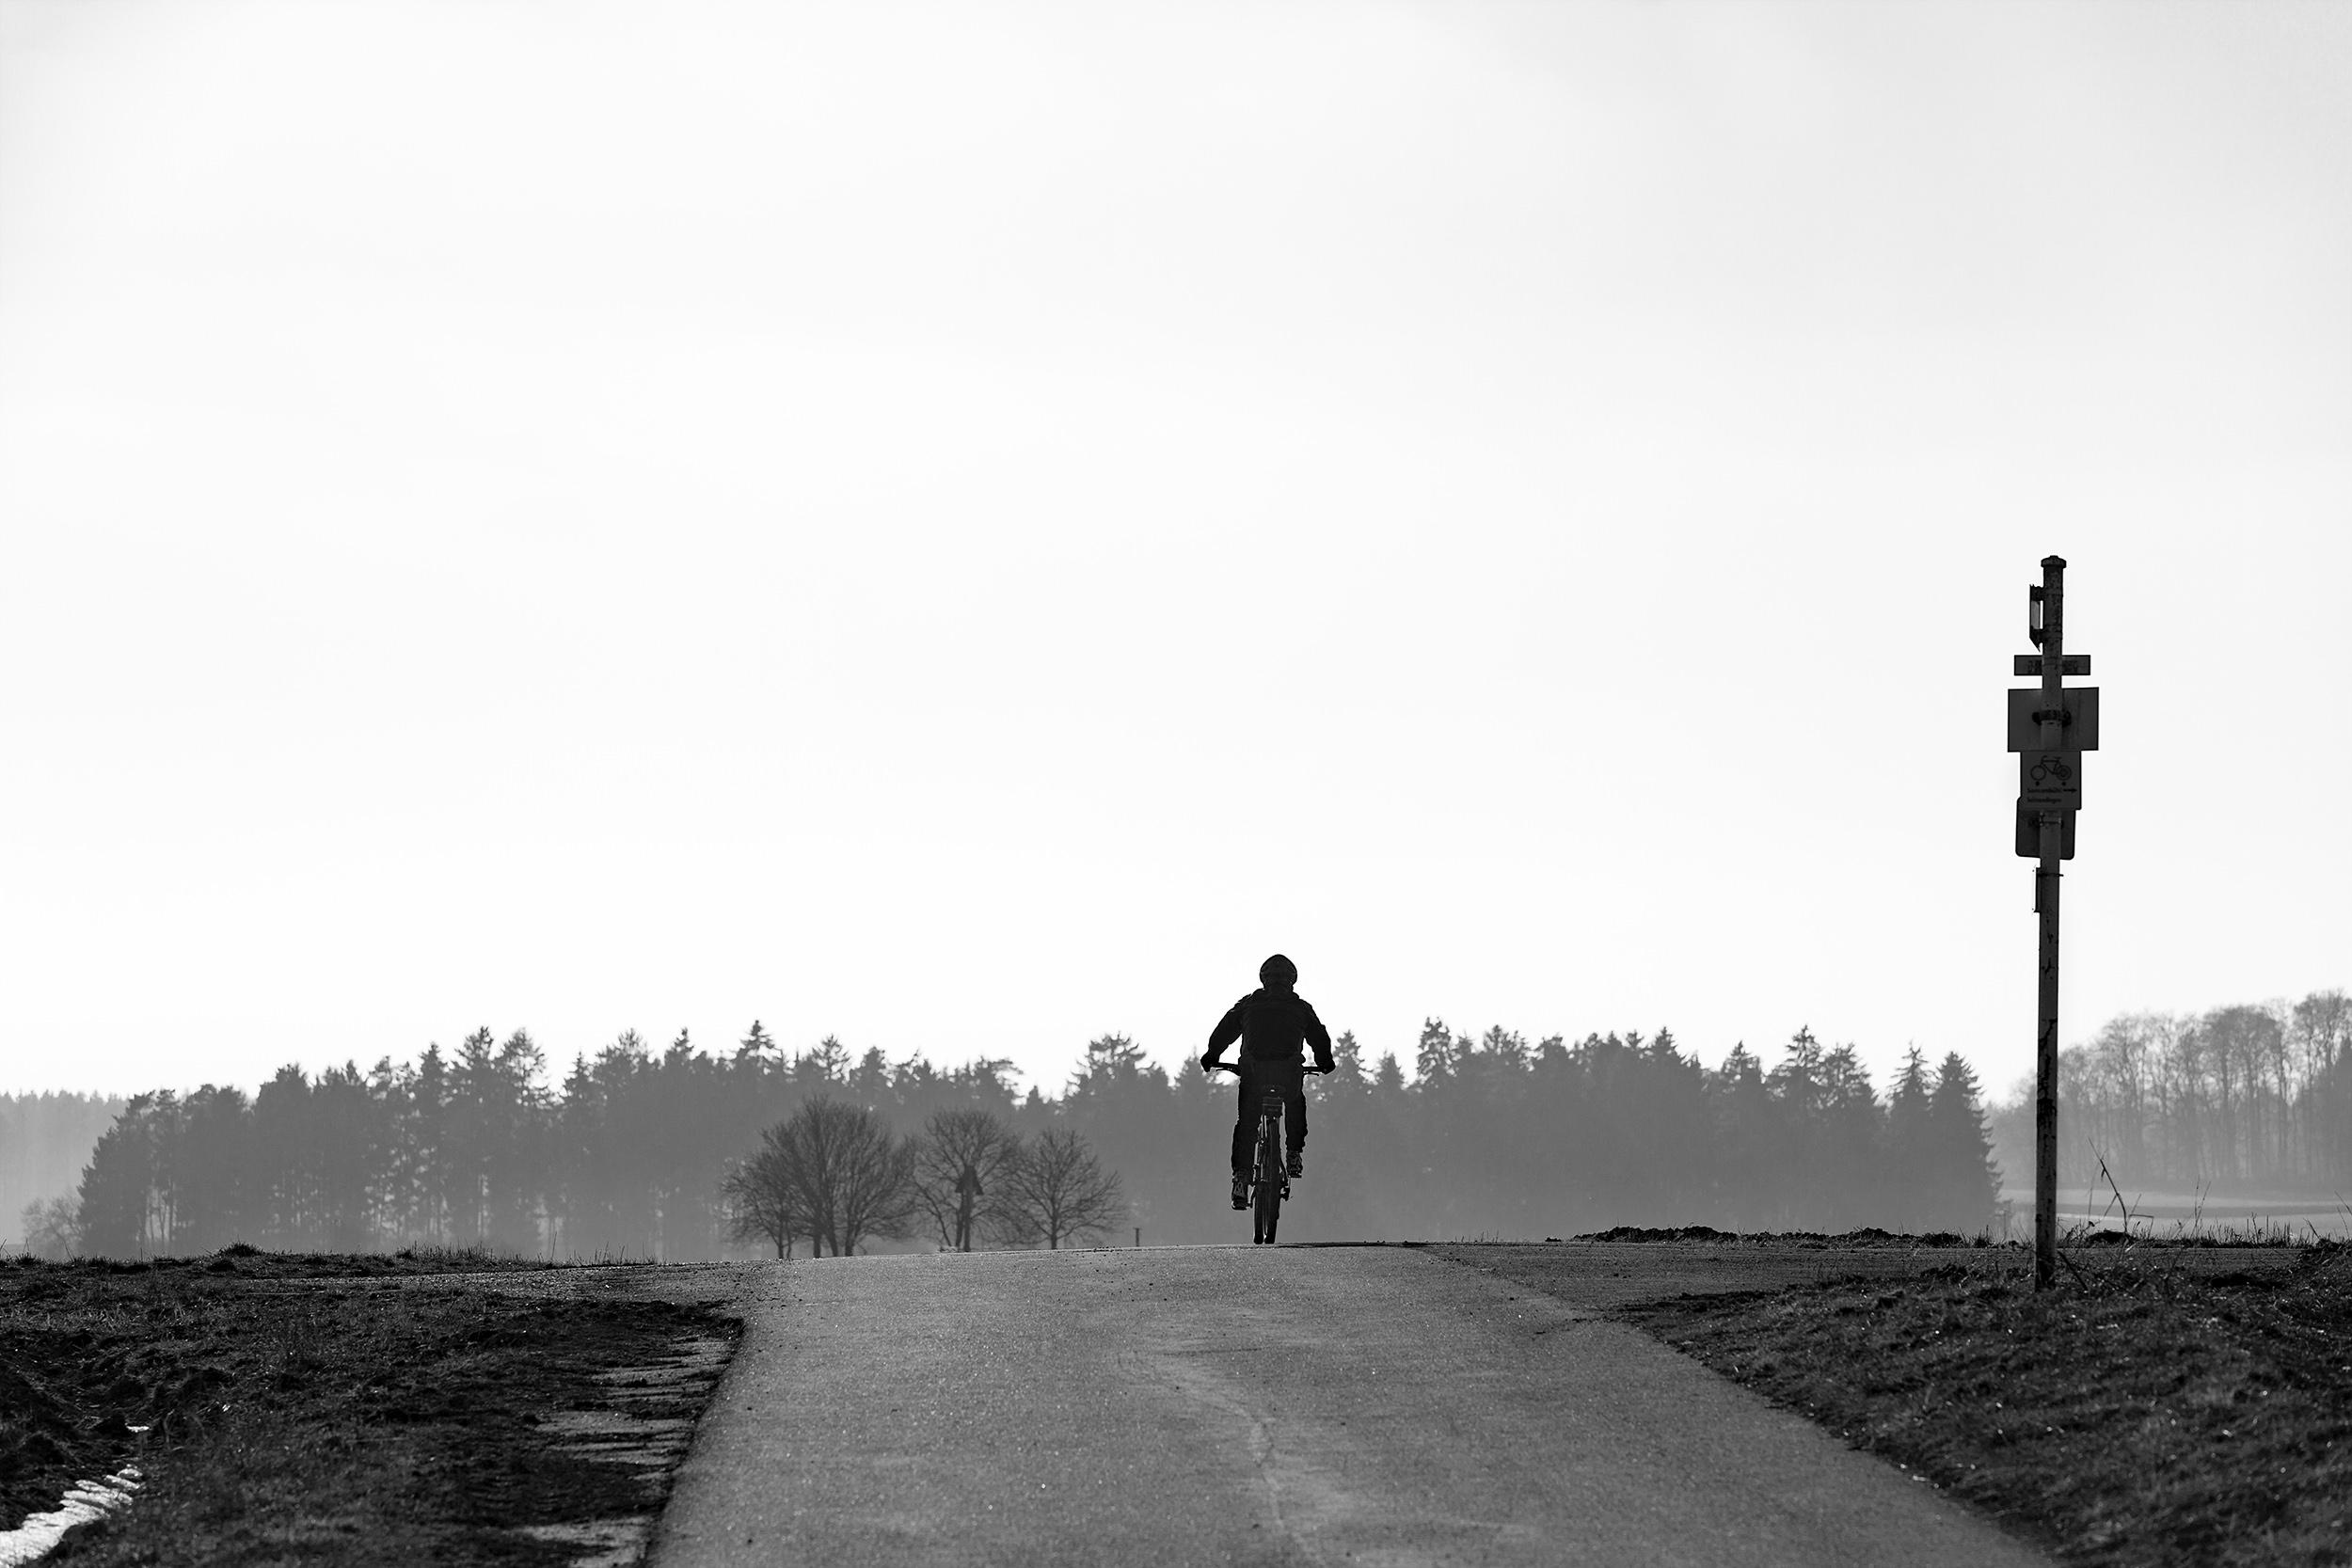 Radfahrer auf Feldweg.